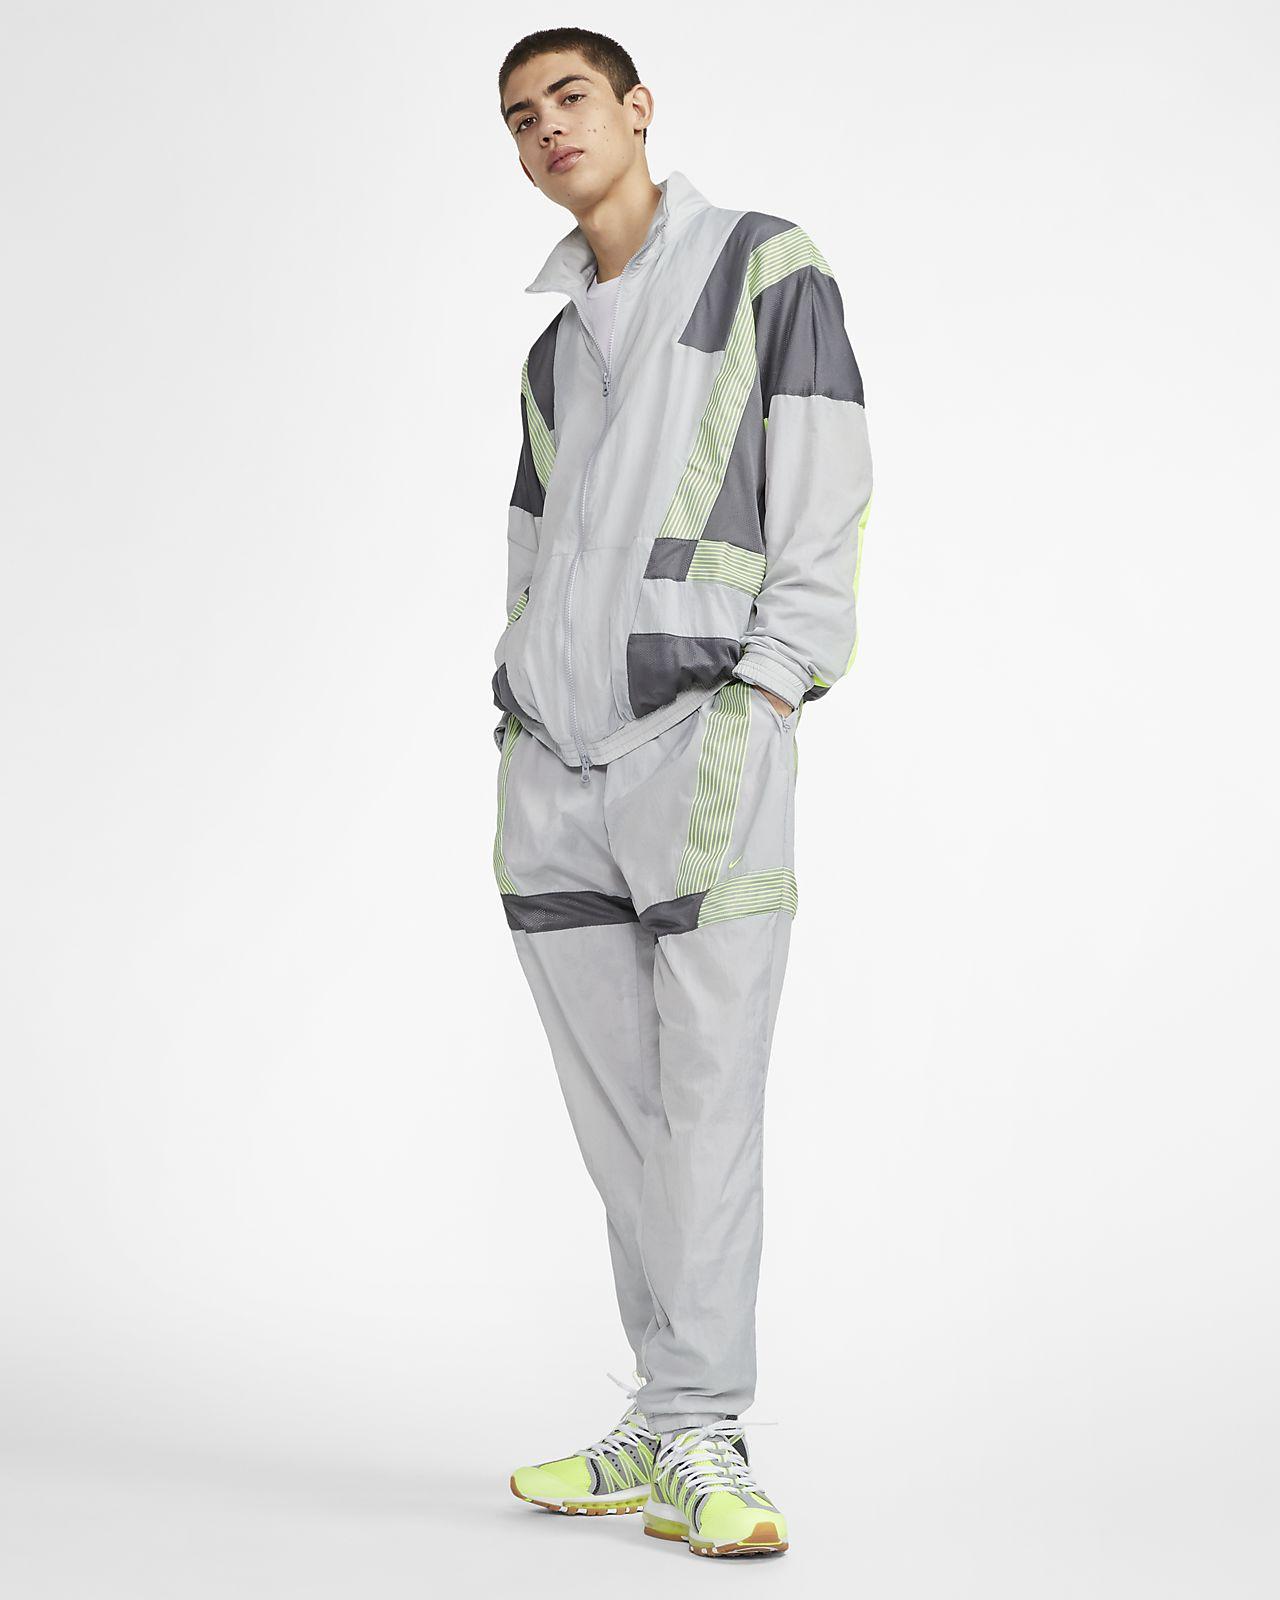 773678f3ac4 Nike x CLOT Men s Tracksuit. Nike.com GB